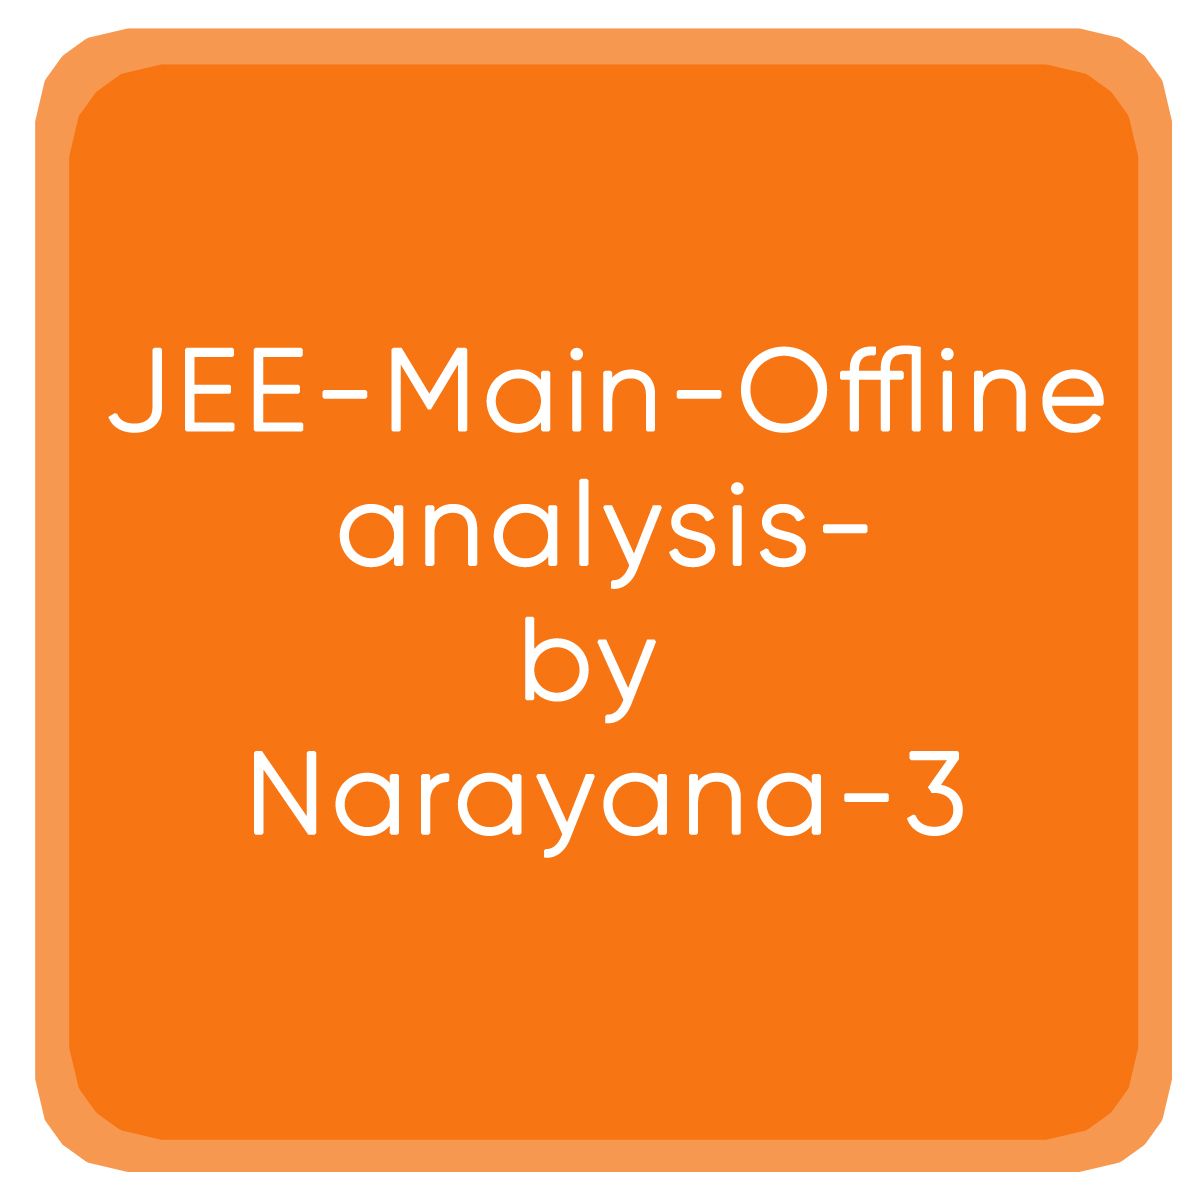 JEE-Main-Offline-analysis-by Narayana-3